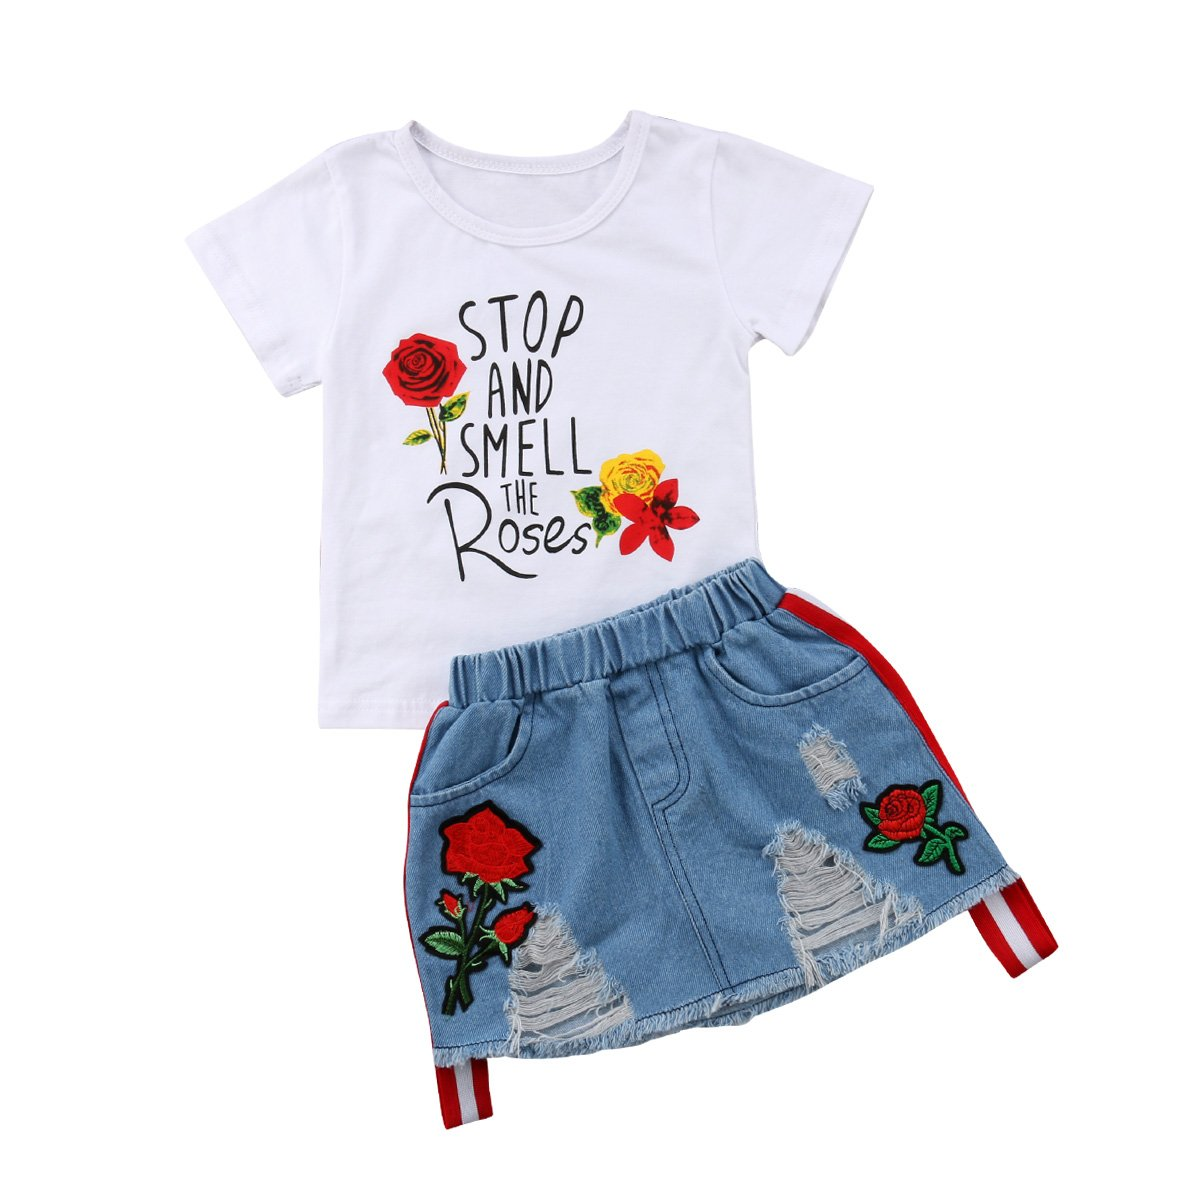 Toddler Kids Girl Denim Skirt Set with Rose Flower Letter Print T-Shirt Tops 2pcs Outfits